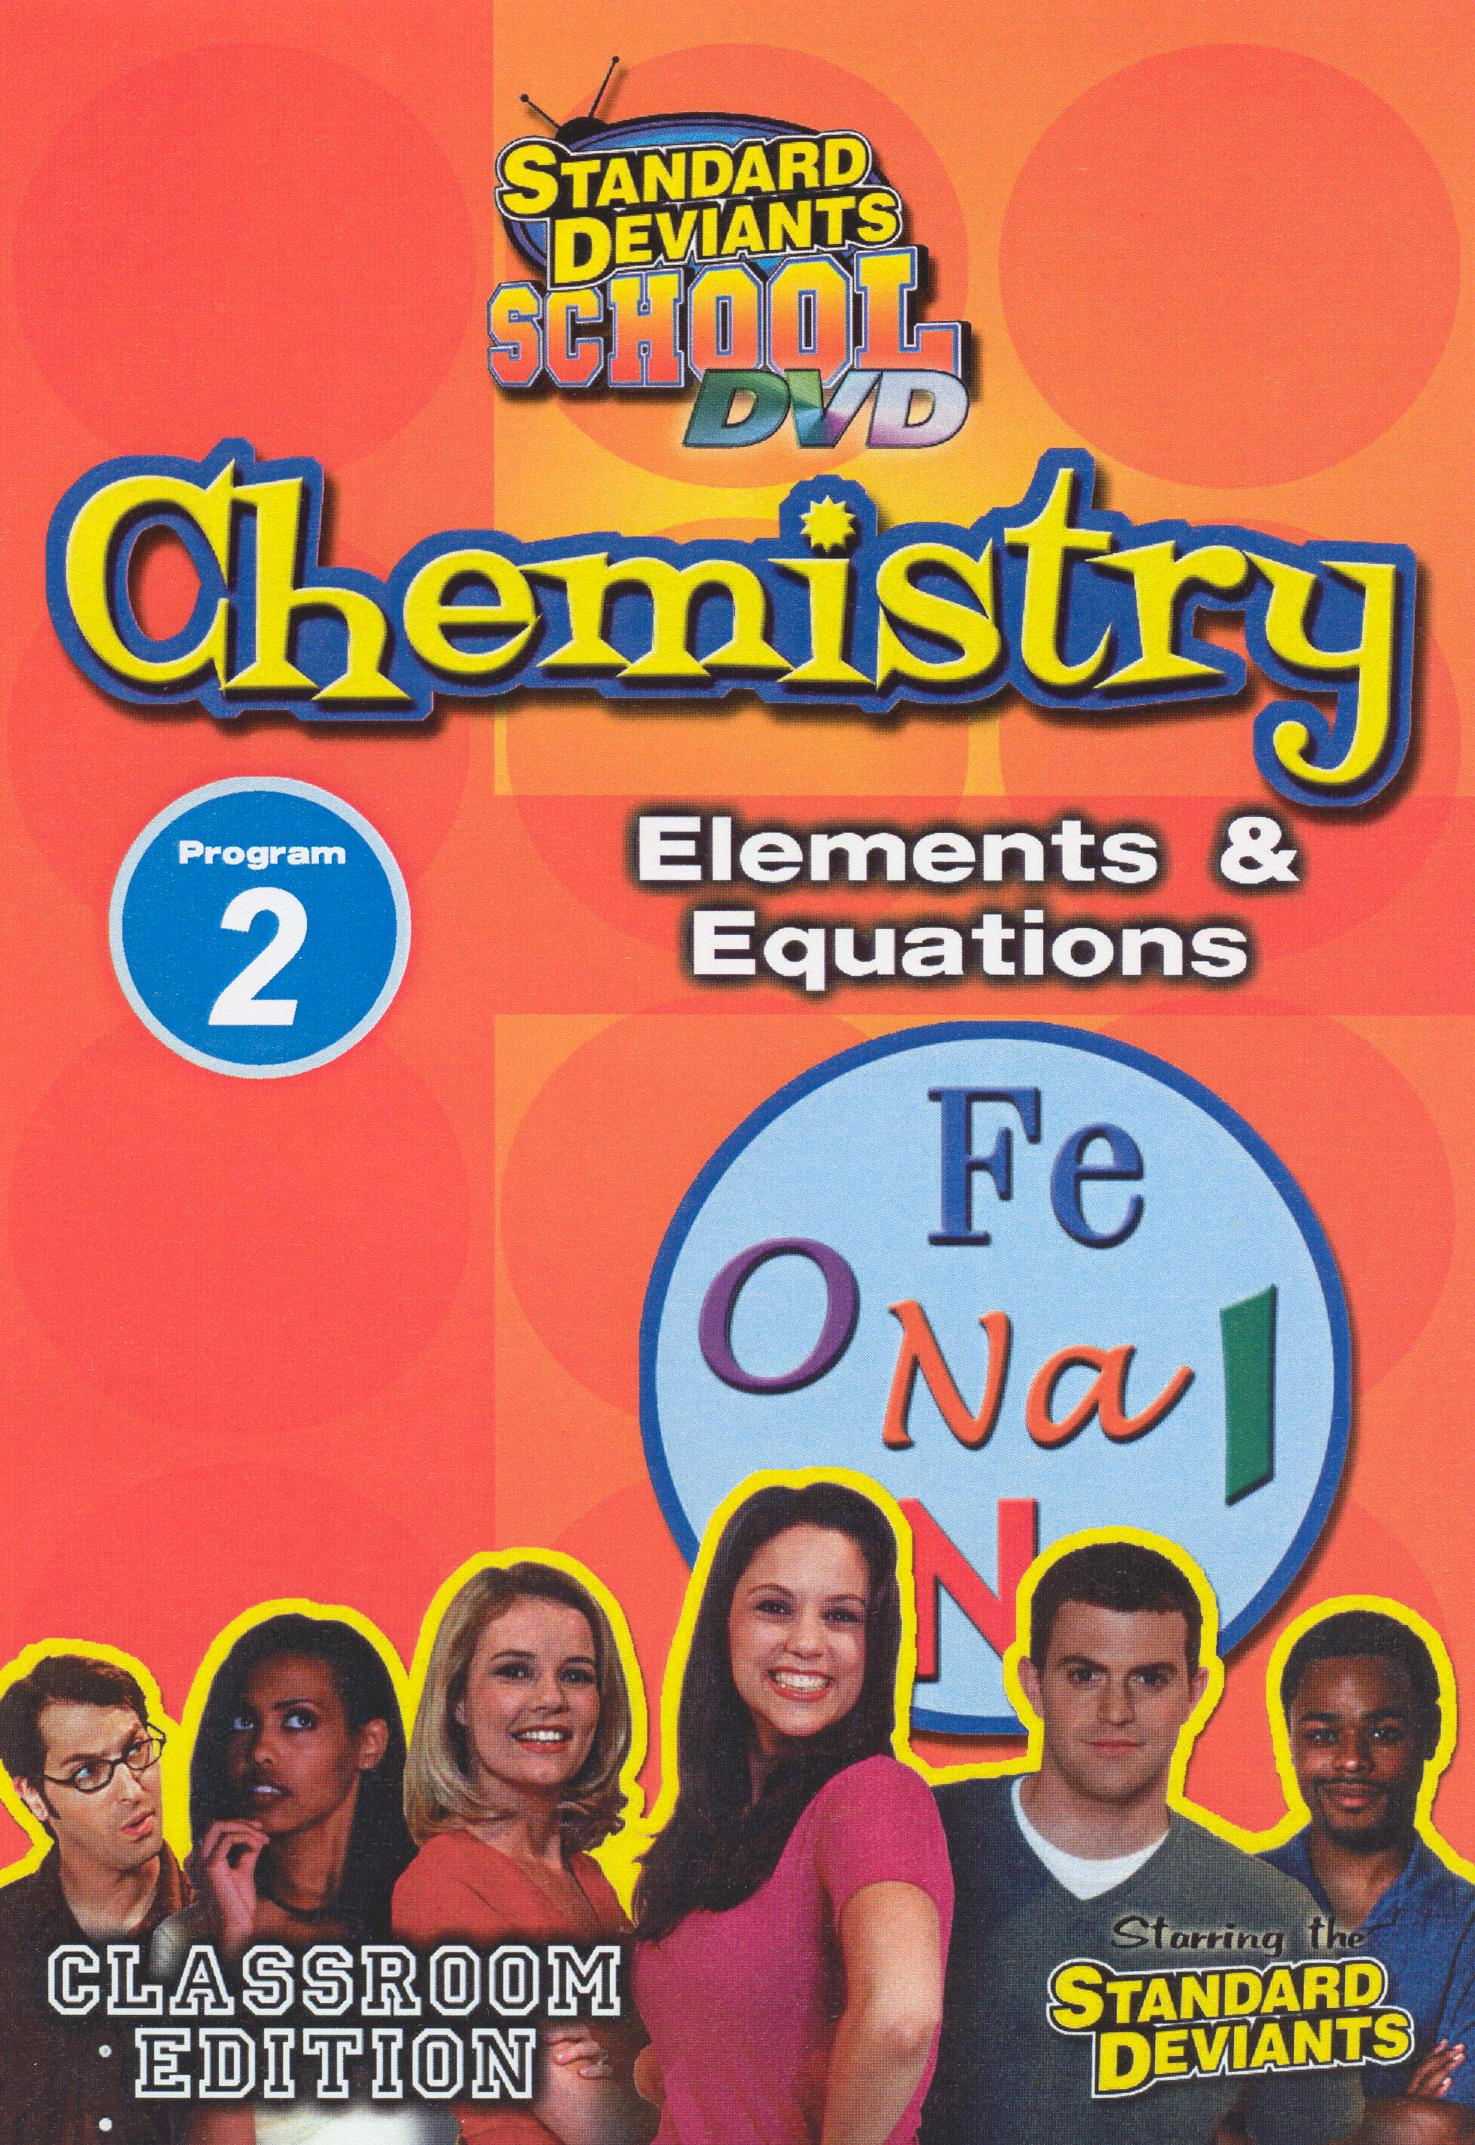 Standard Deviants School: Chemistry, Program 2